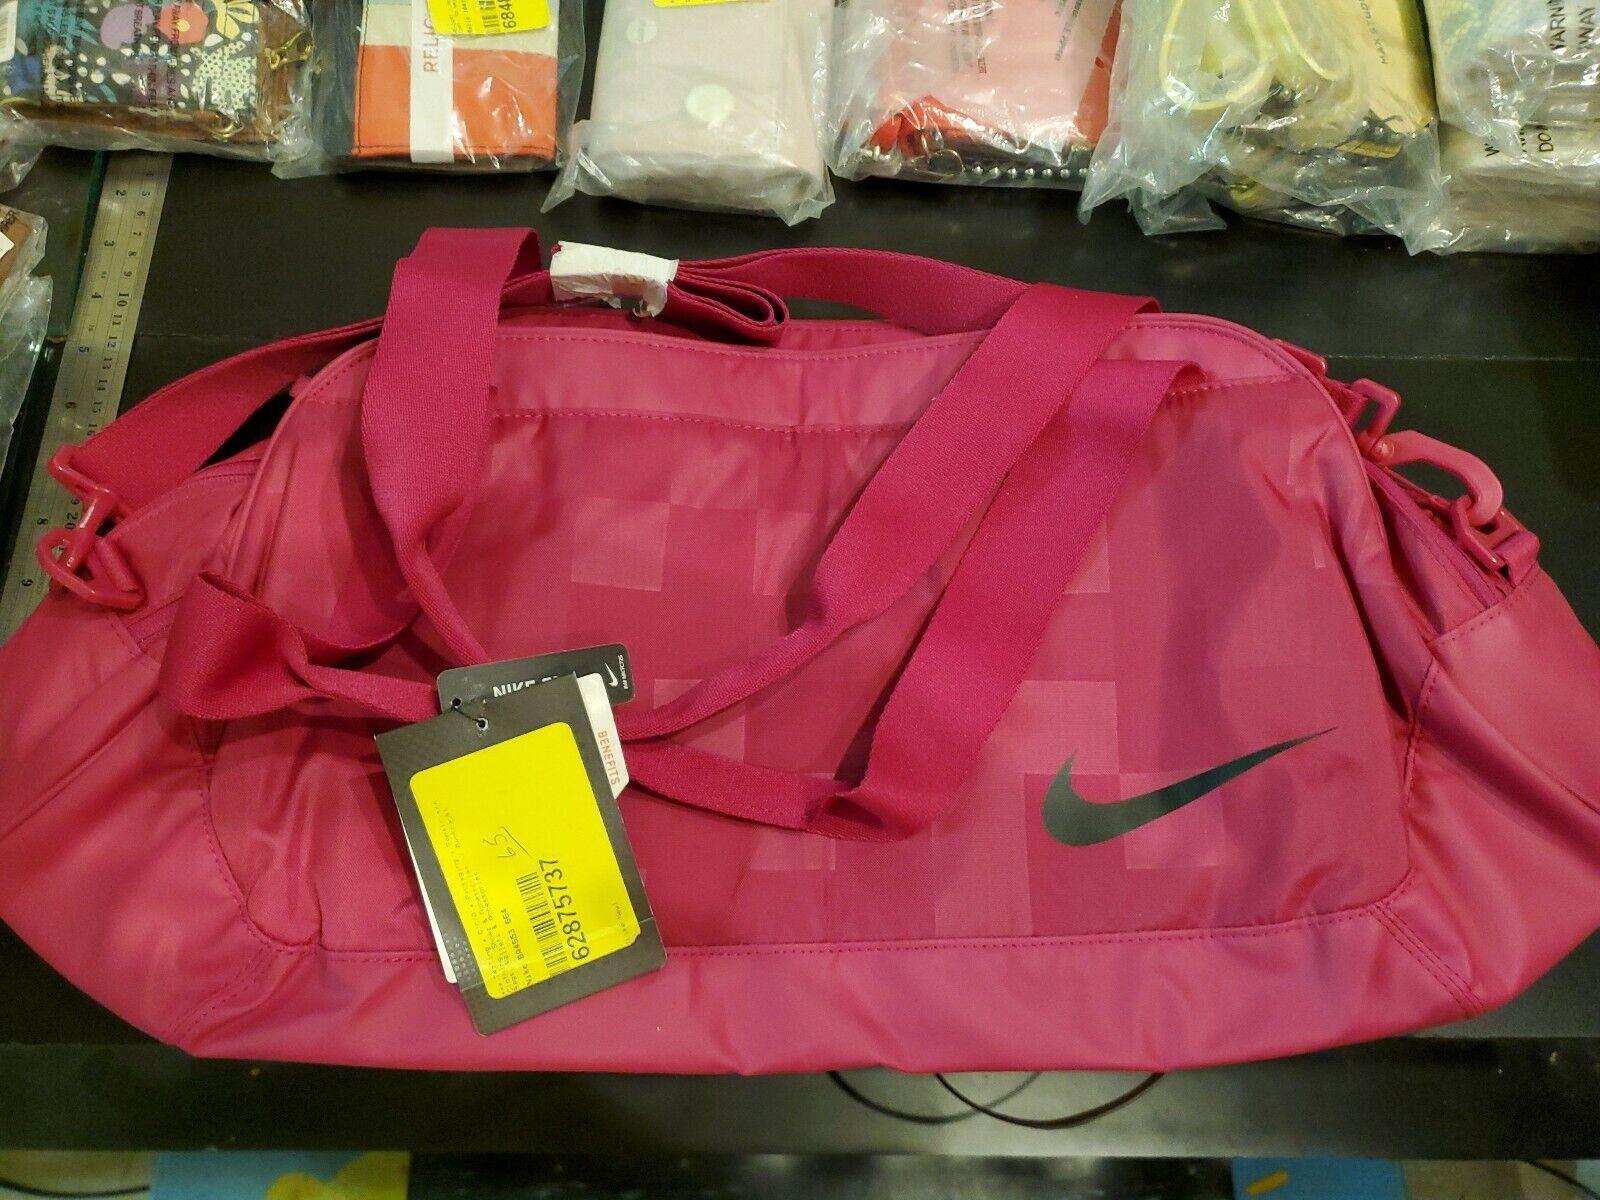 Ecología Significativo resbalón  Nike BA4653 664 Women's C72 Legend 2.0 Medium Club Duffel Gym Bag Fuchsia  BA4653 for sale online